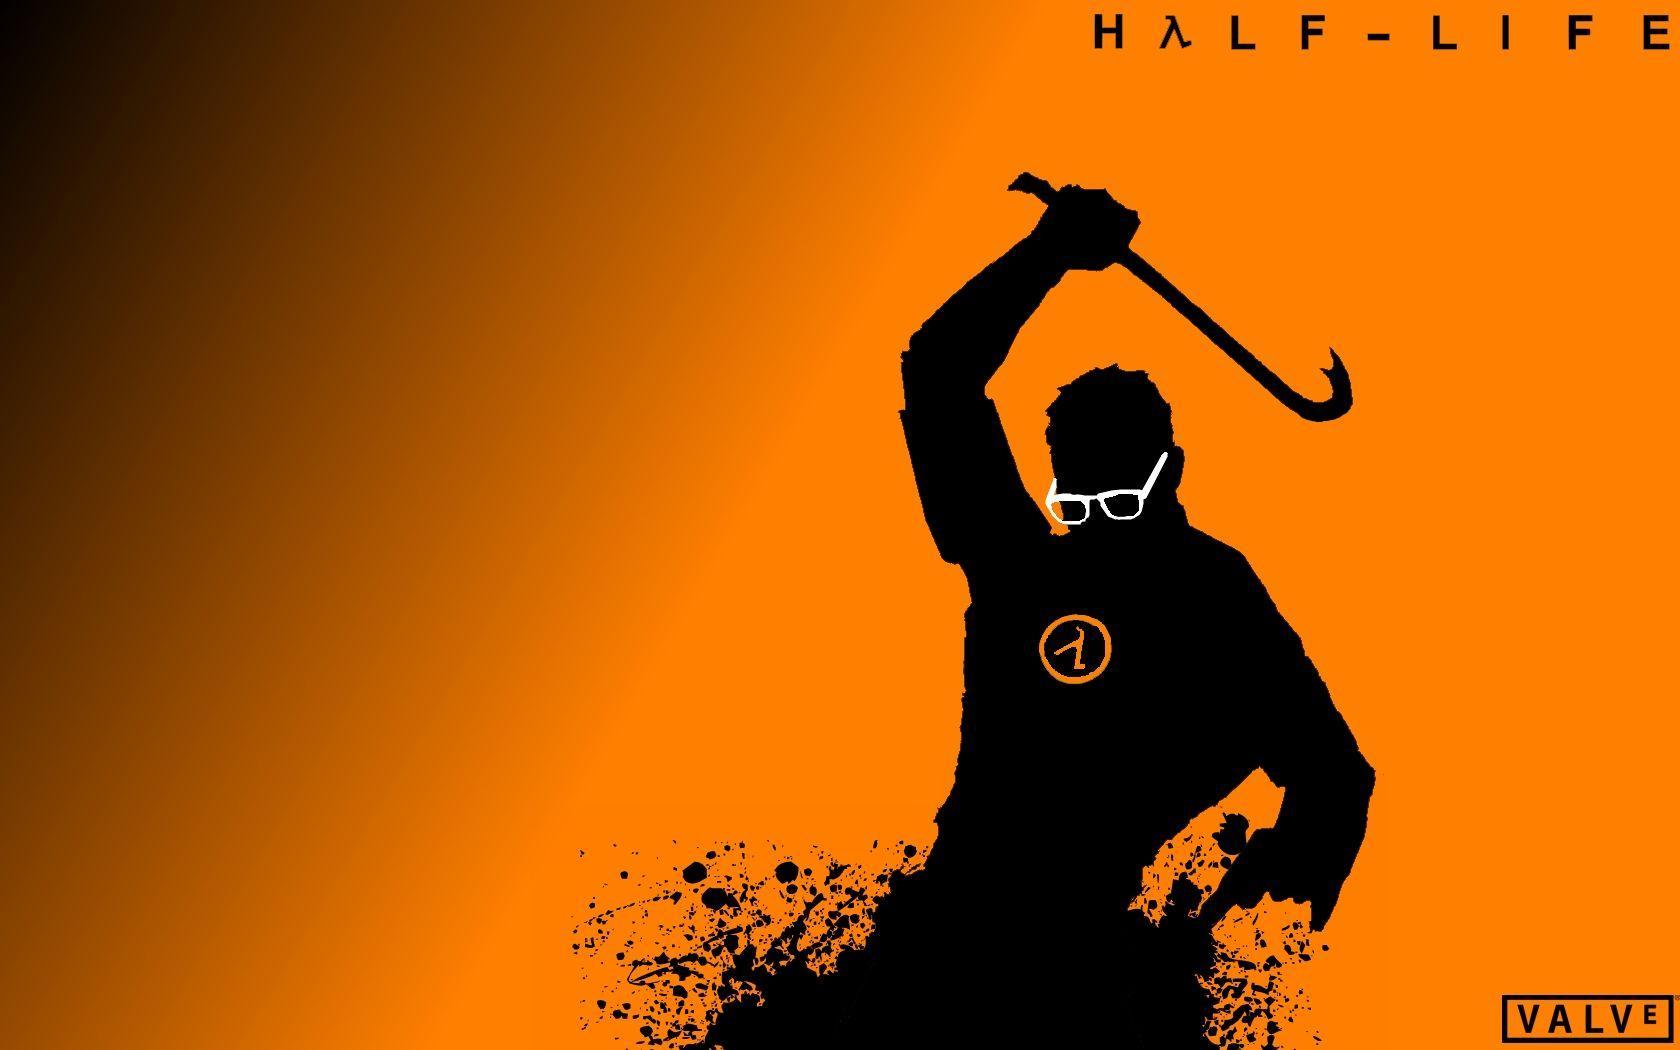 Half Life Wallpapers Top Free Half Life Backgrounds